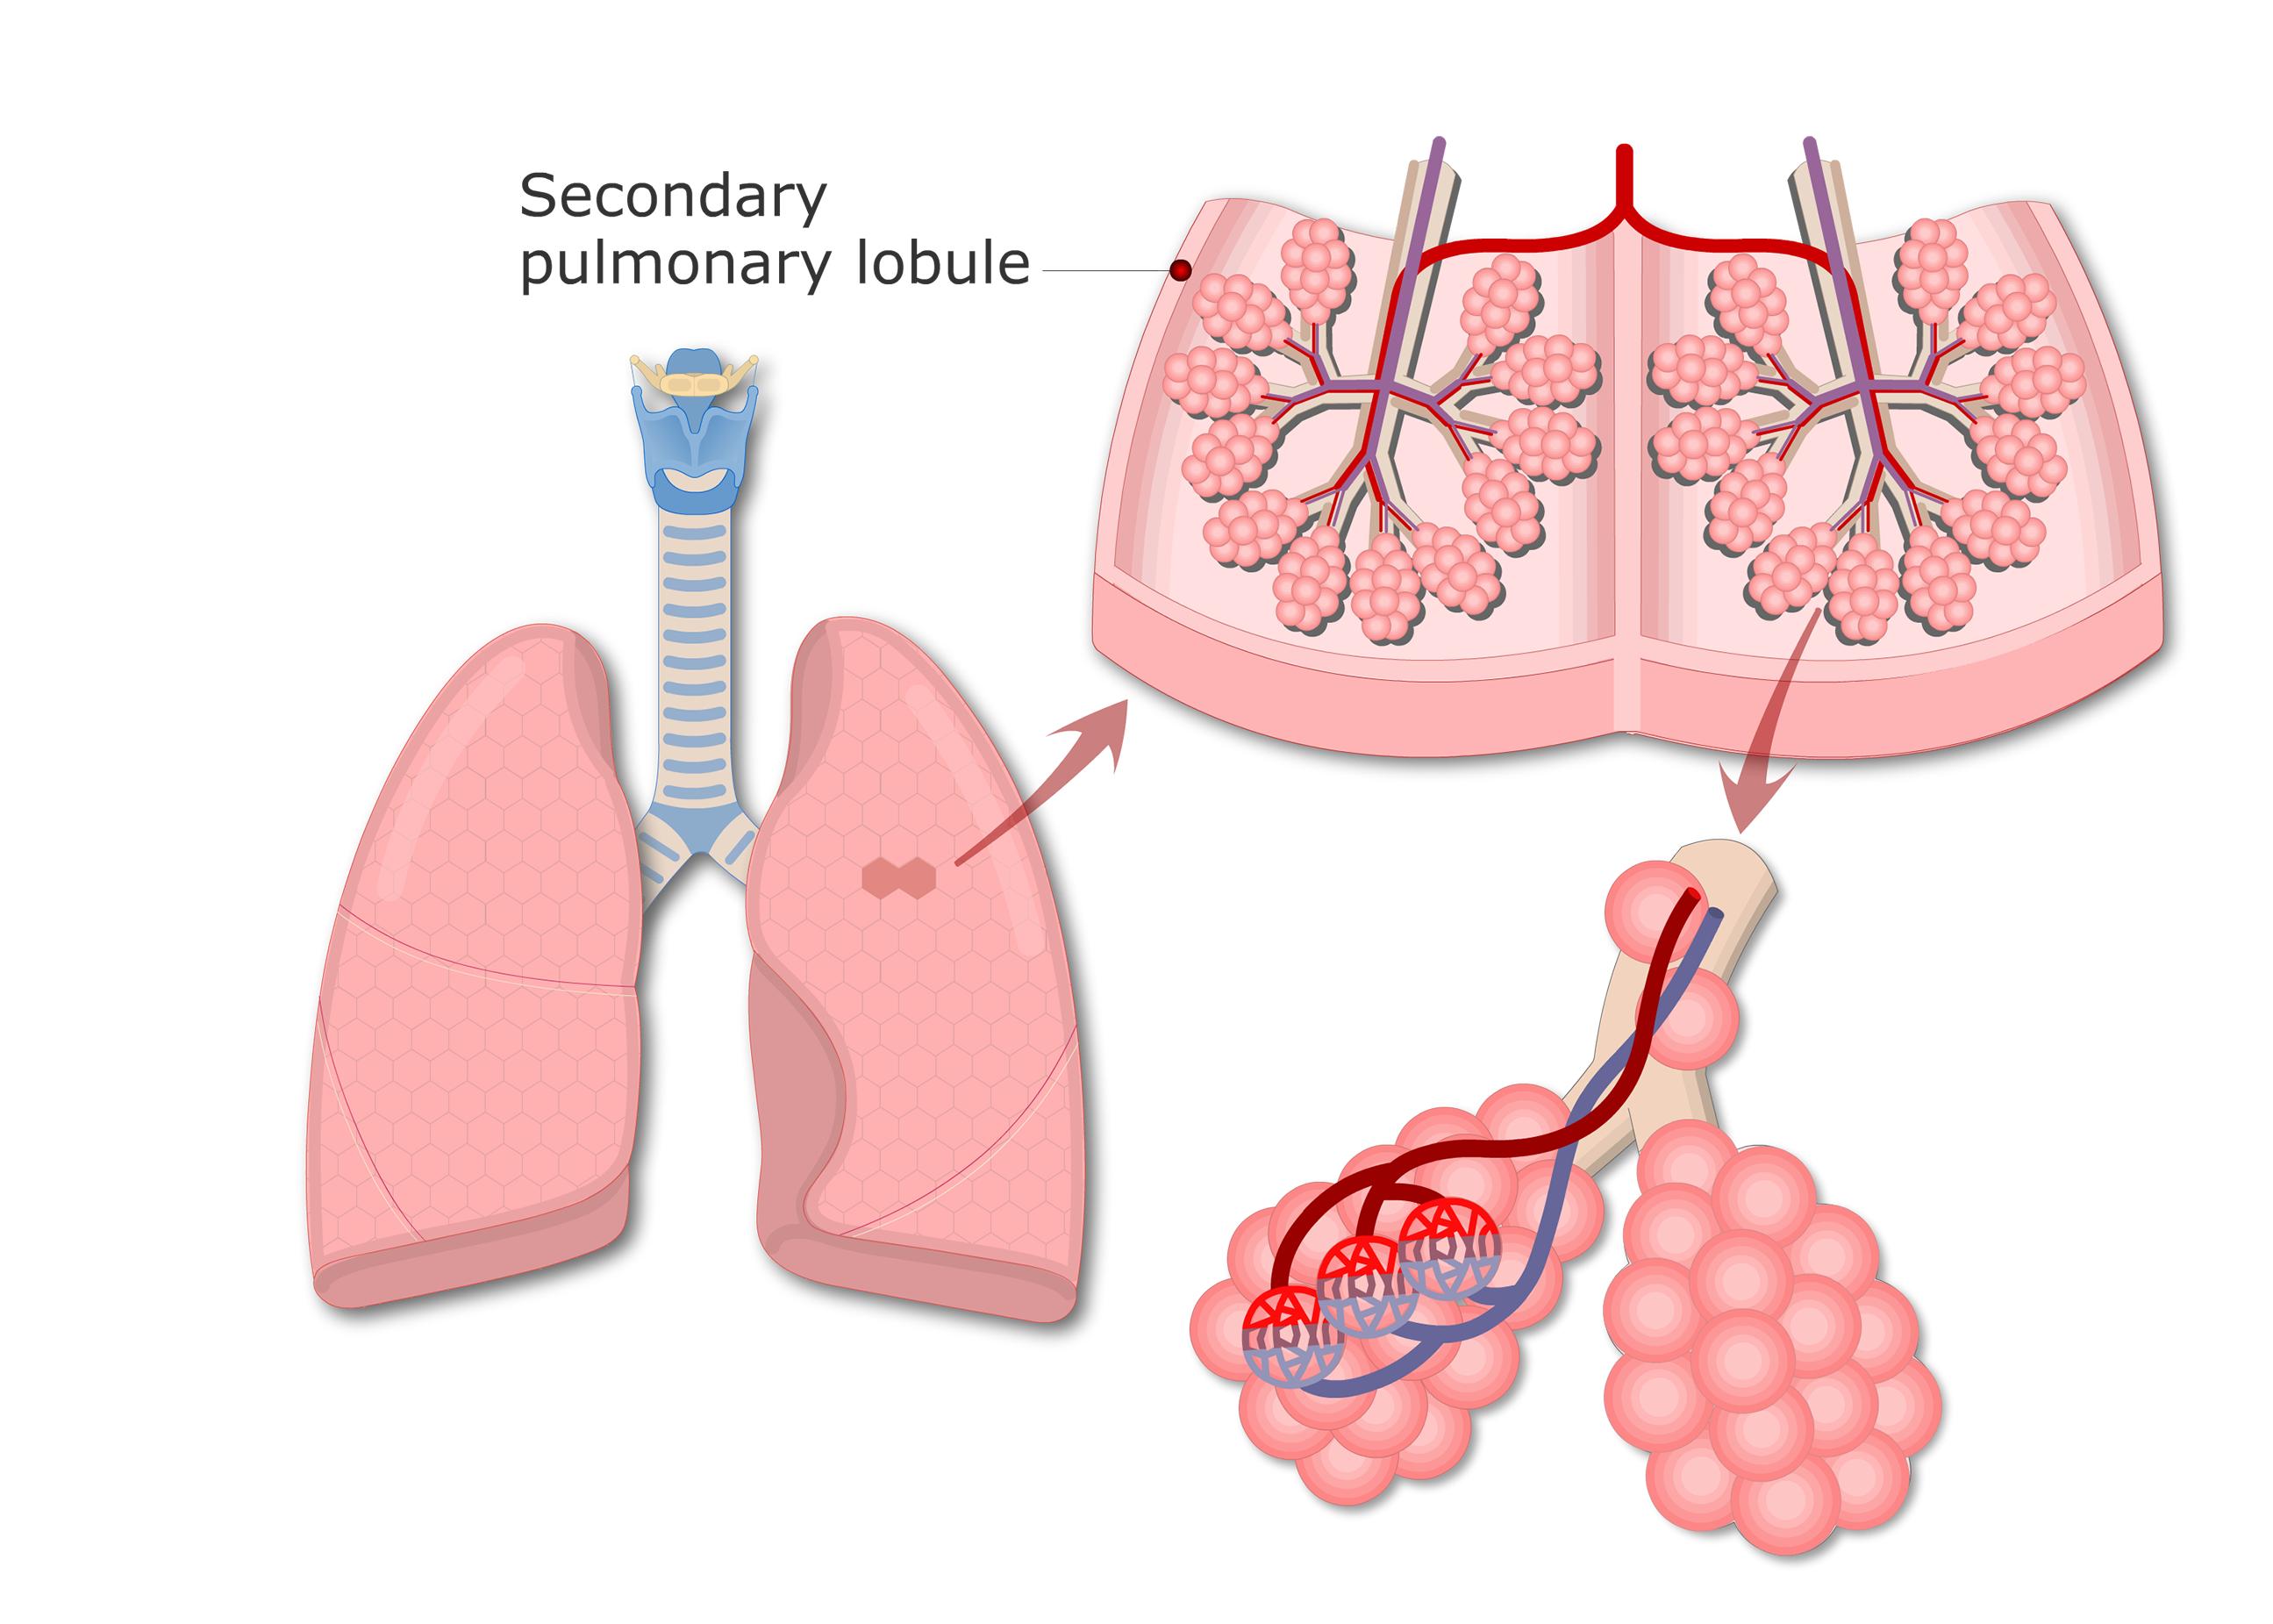 Lung Alveoli Location Of Alveolar Ducts And Alveolar Sacs